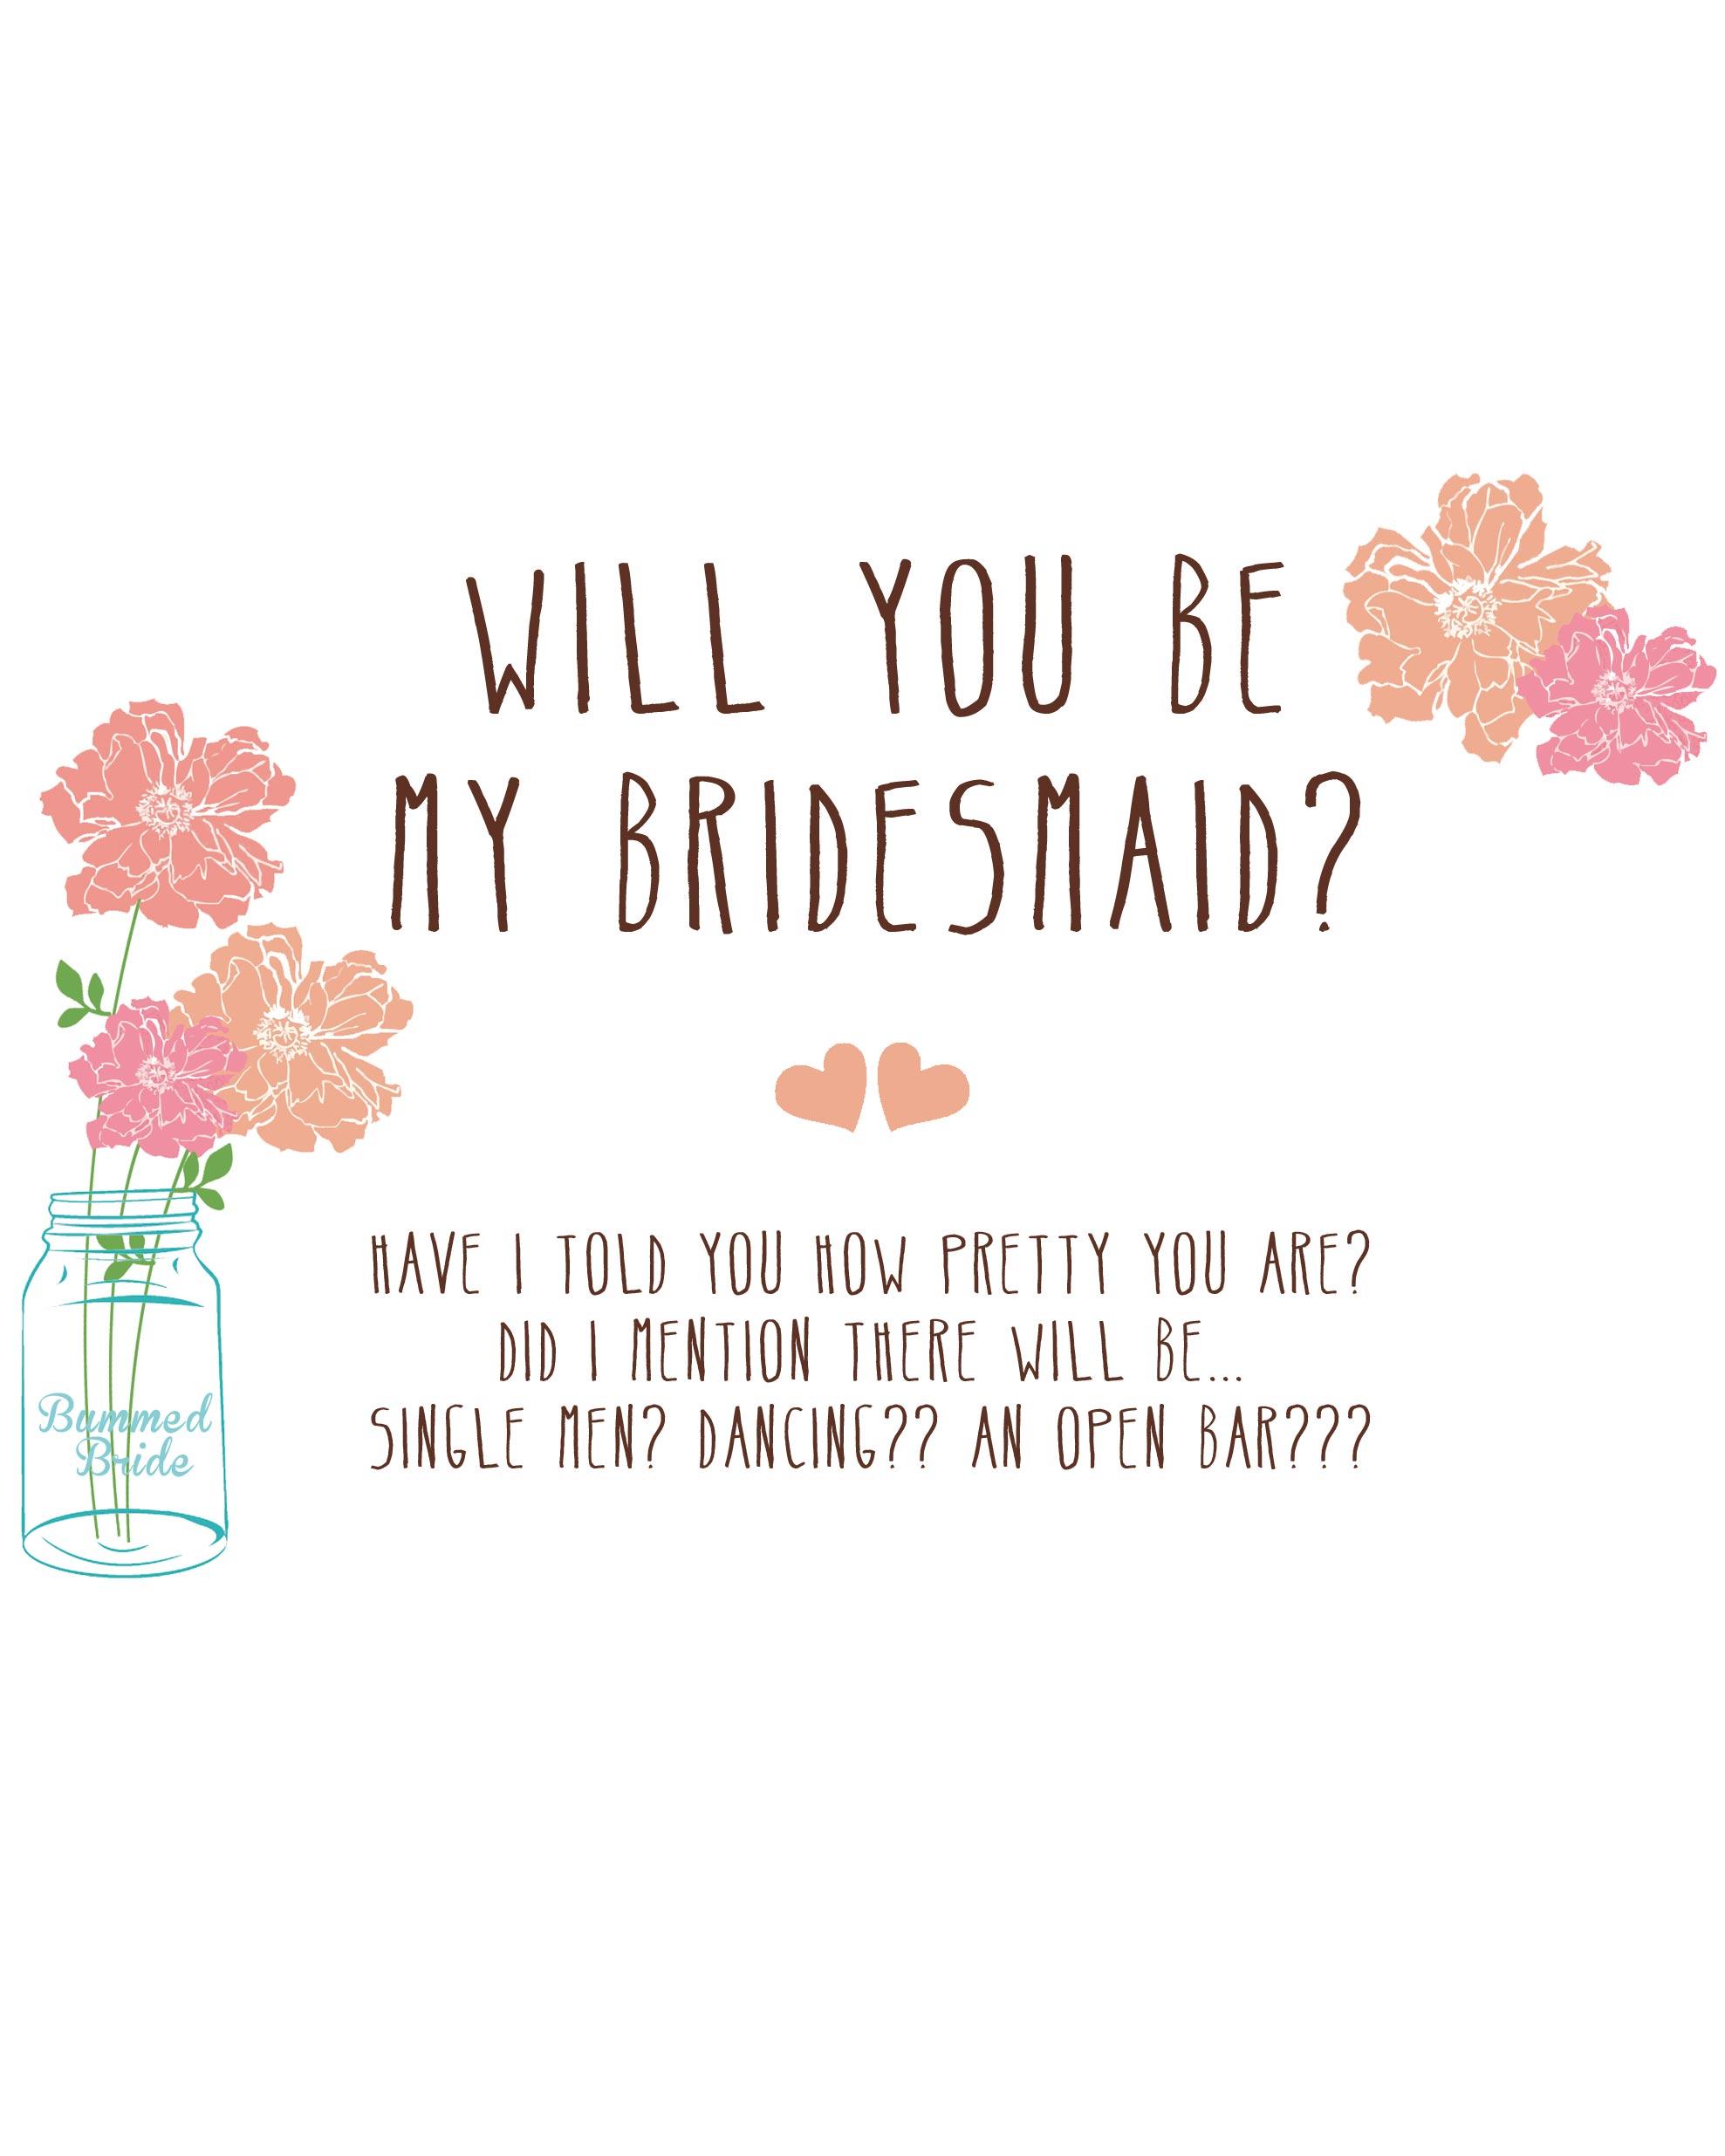 bummed-bride-will-you-be-my-bridesmaid-card-0216.jpg